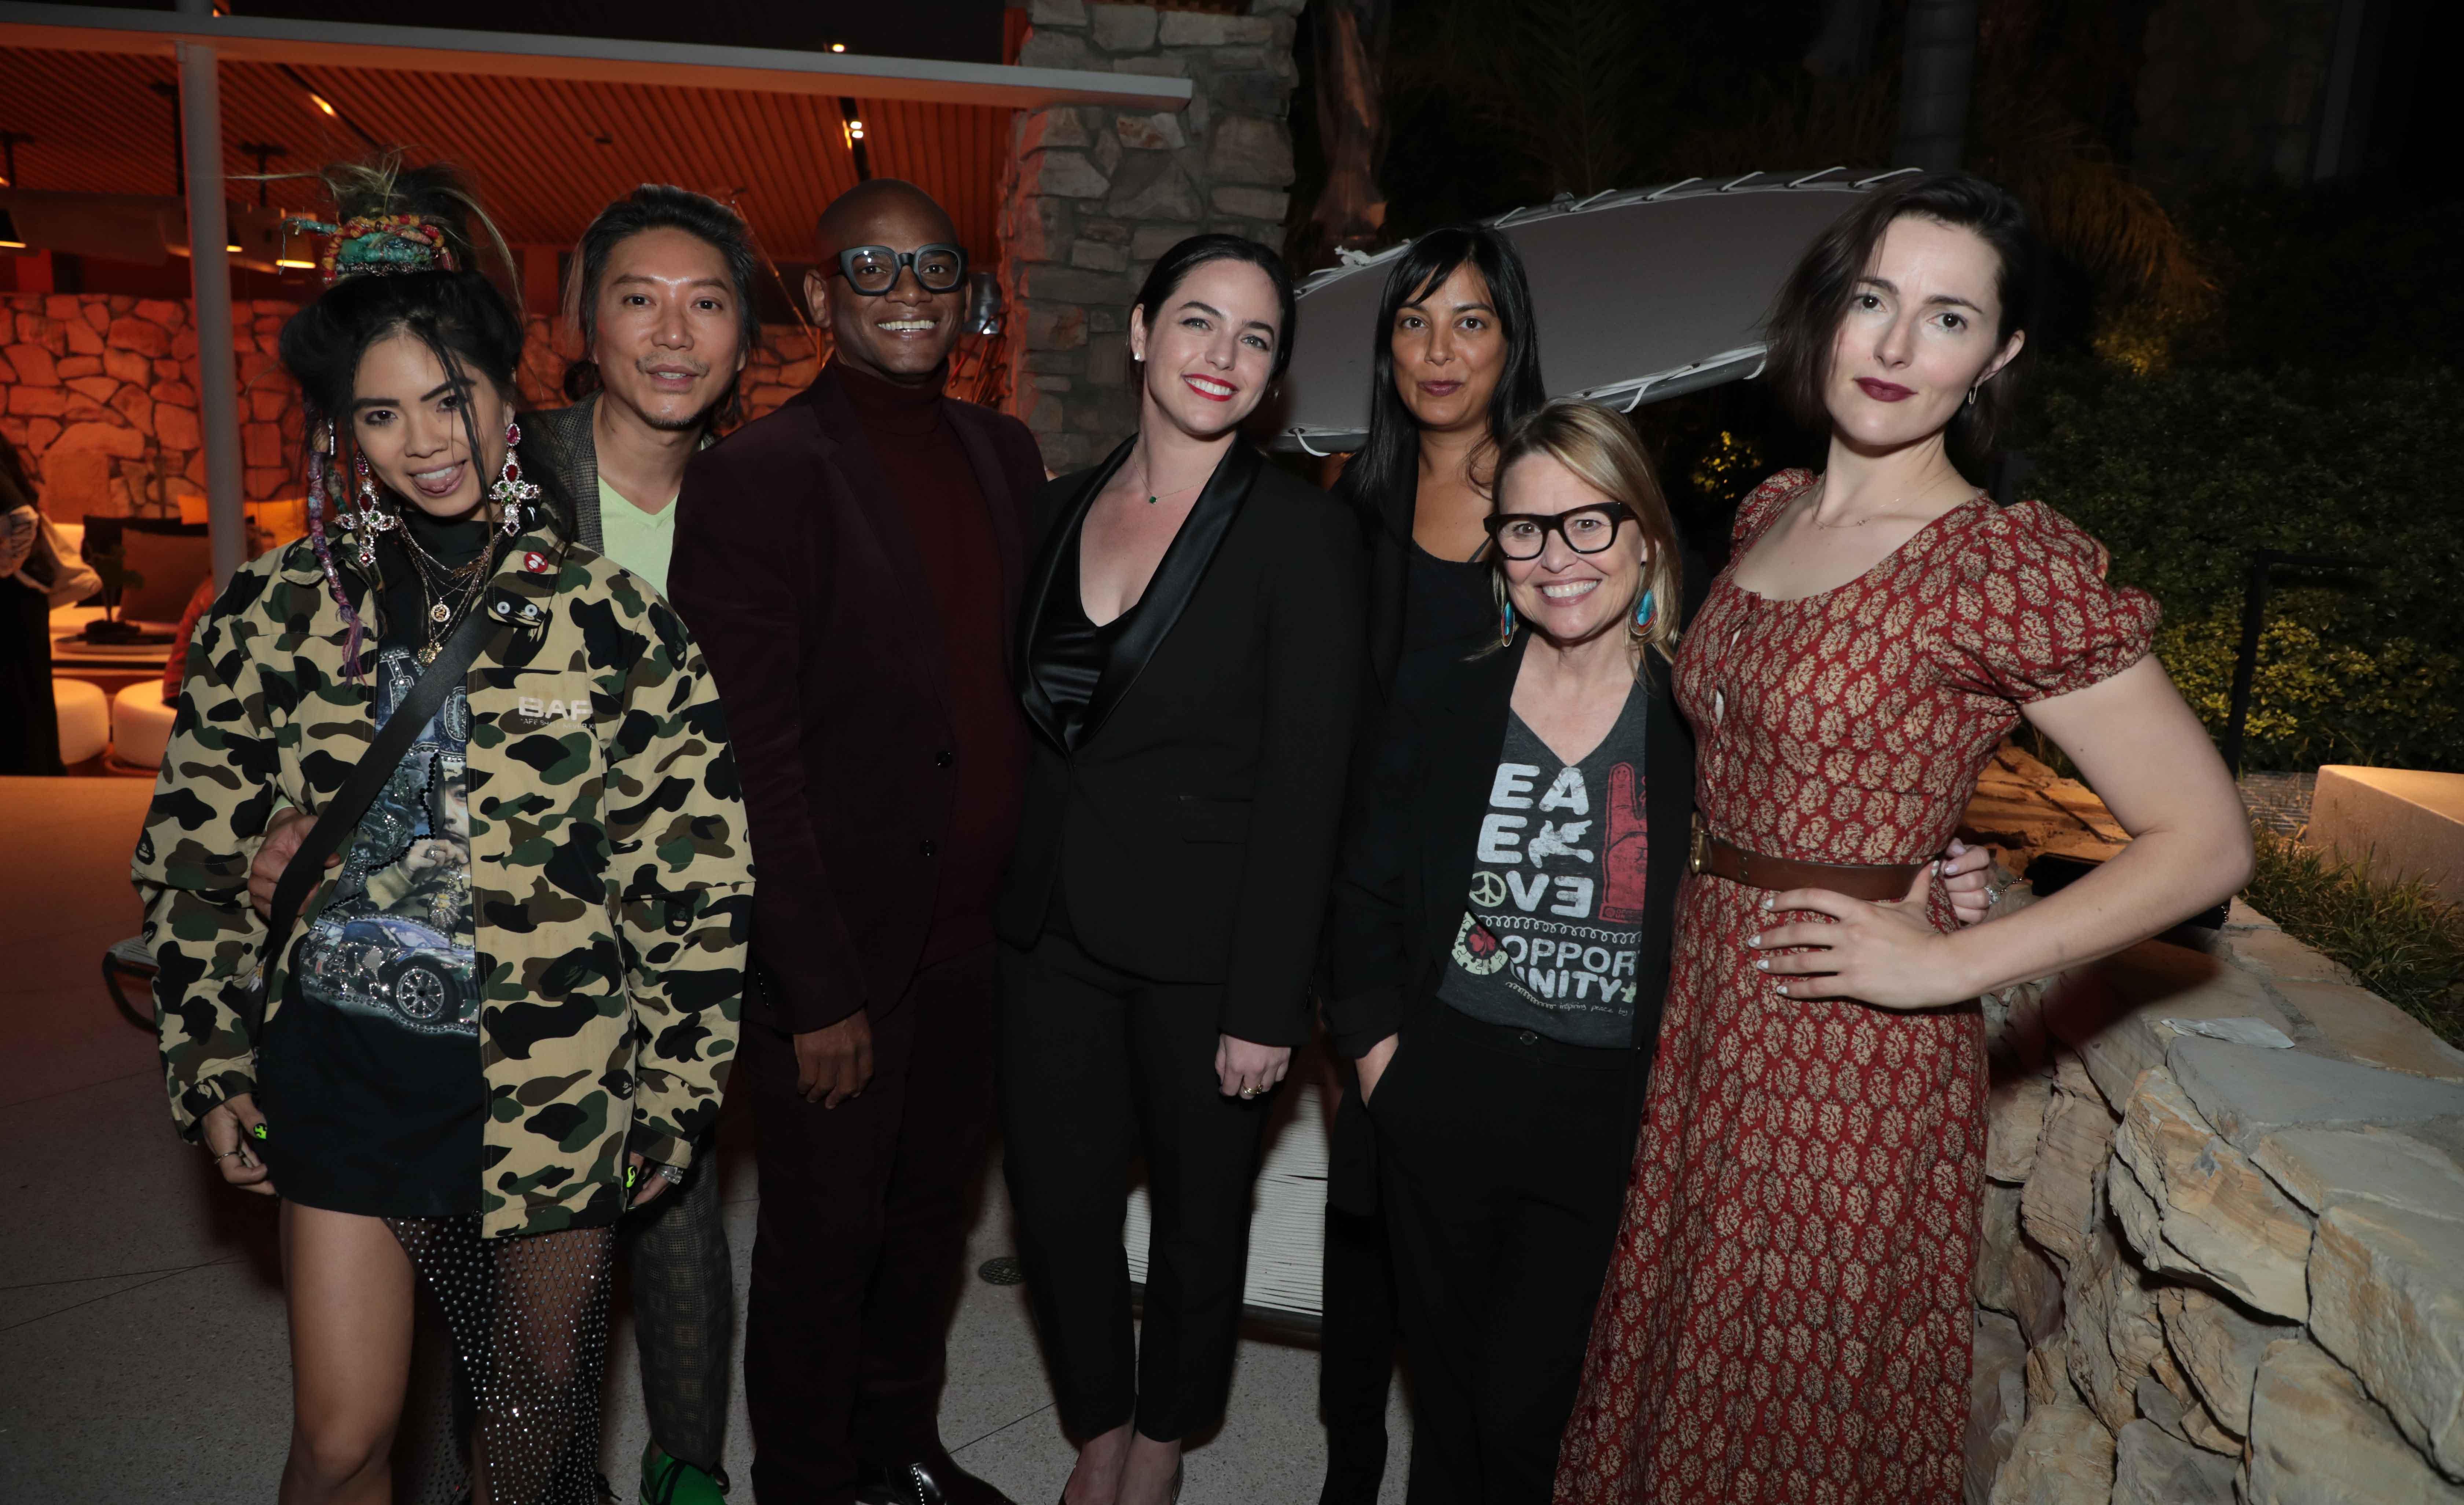 Ann Marie Hoang, Hau Nguyen, Arthur Lewis, Lesley Silverman, Niki Kanodia, Suzette Ramirez Carr and Lizzy Goodman. Photo by ABImages